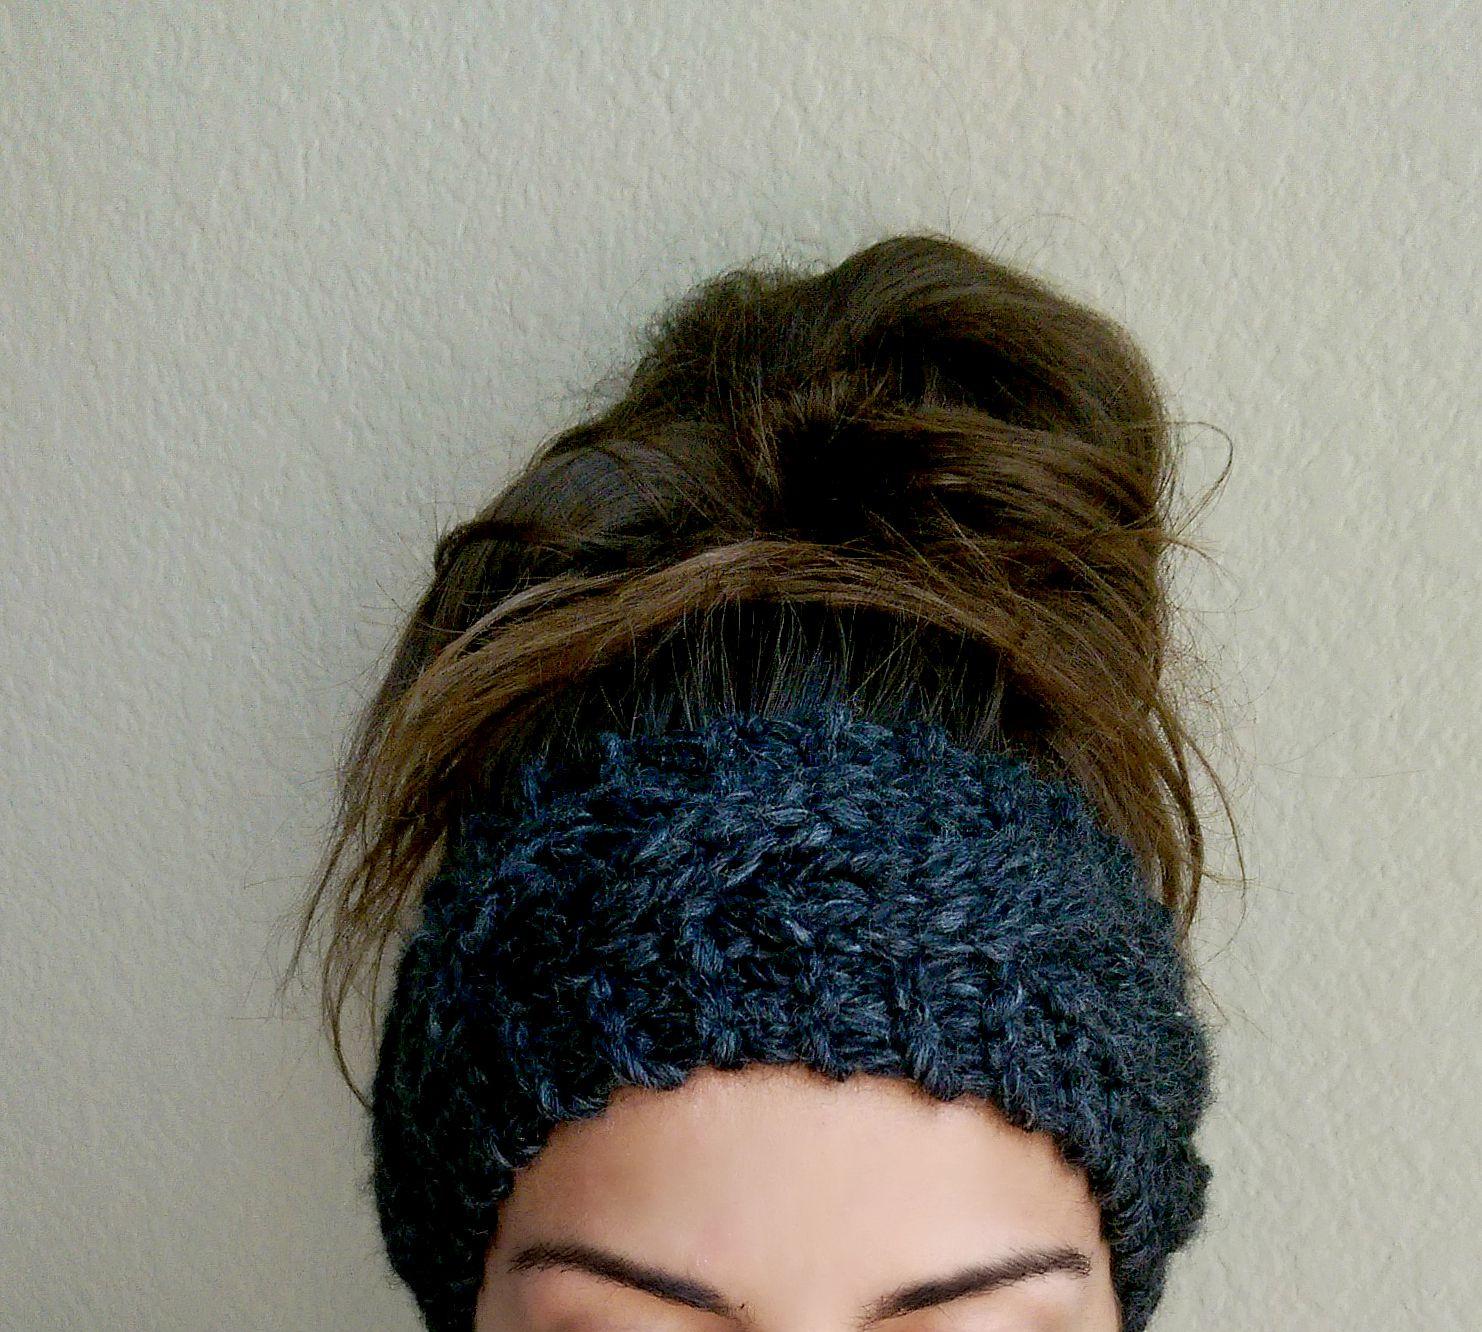 Knitting Patterns Headbands Ear Warmer 10 Knit Headband Ear Warmer Patterns The Funky Stitch